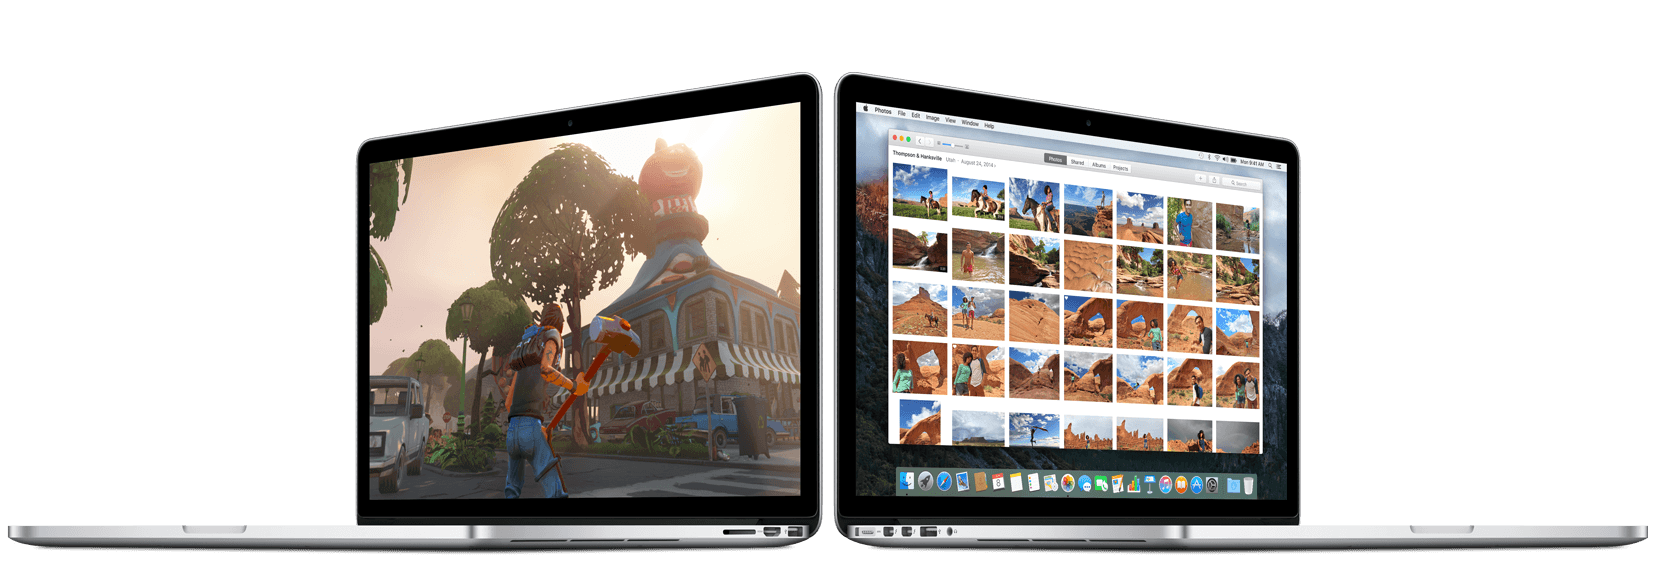 Mac OS X El Capitan. Le caratteristiche